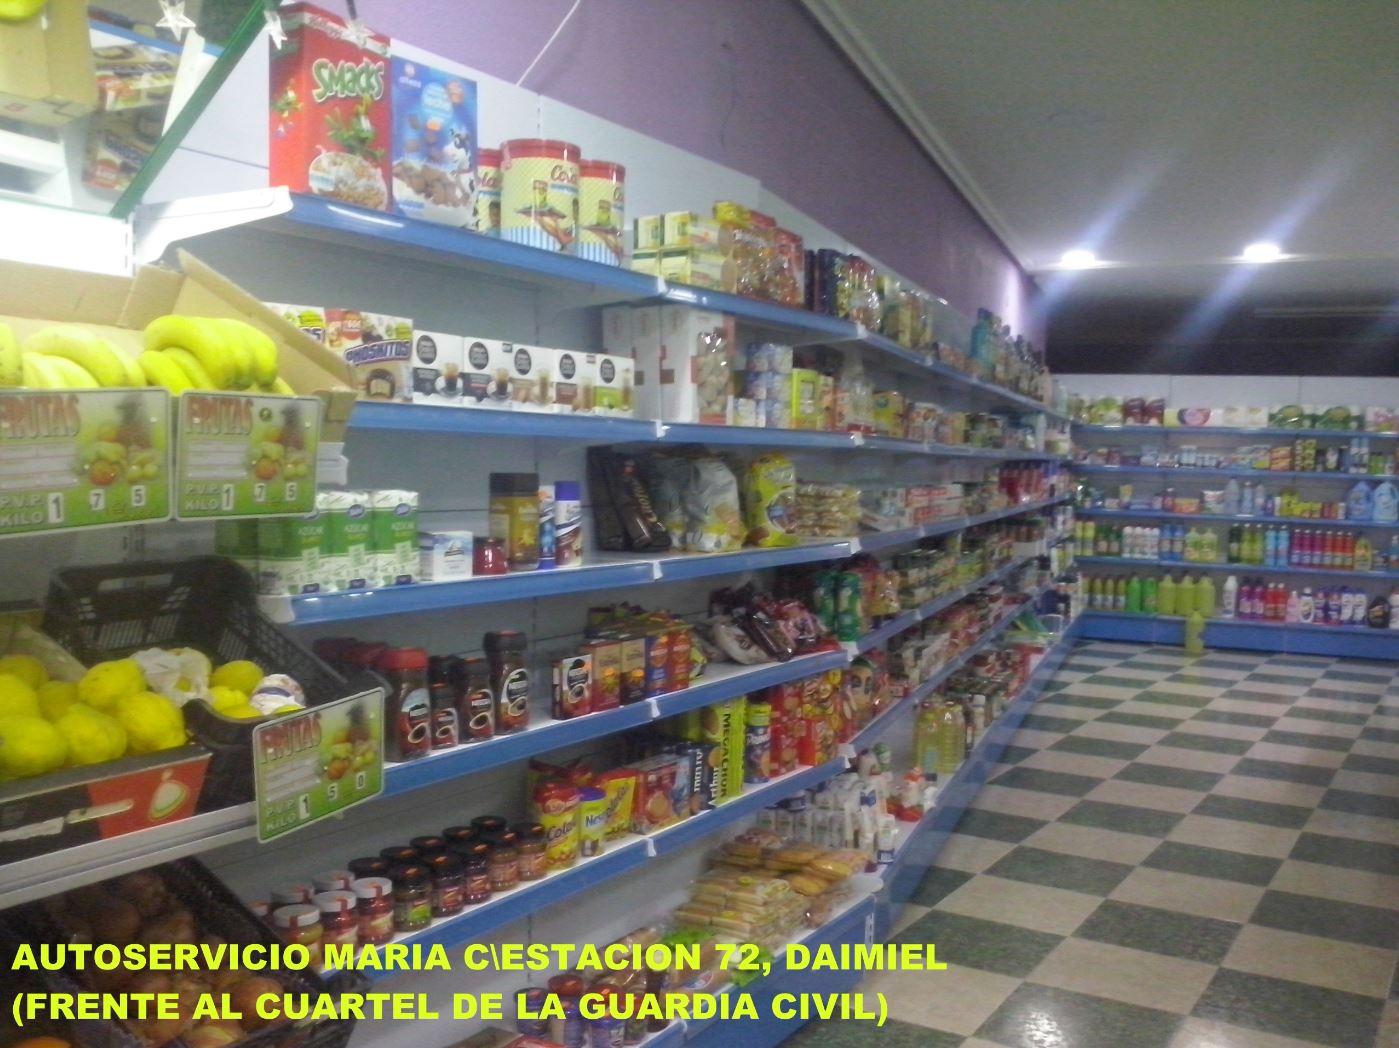 AUTOSERVICIO MARIA